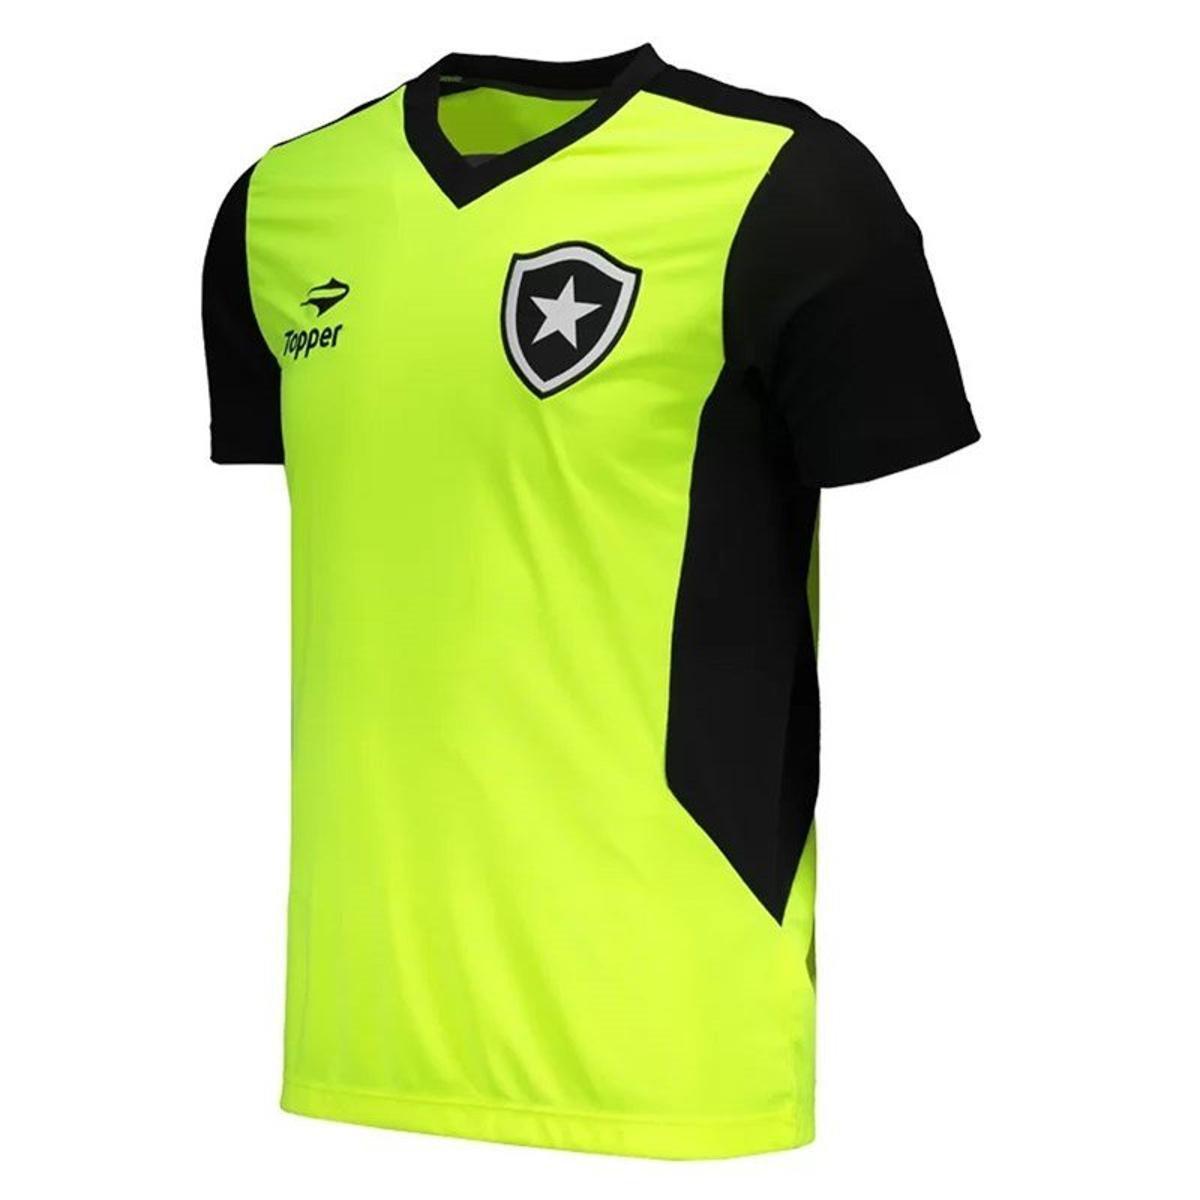 Camisa Topper Botafogo Treino Masculina  Camisa Topper Botafogo Treino  Masculina ... cc0c0eef6ee27